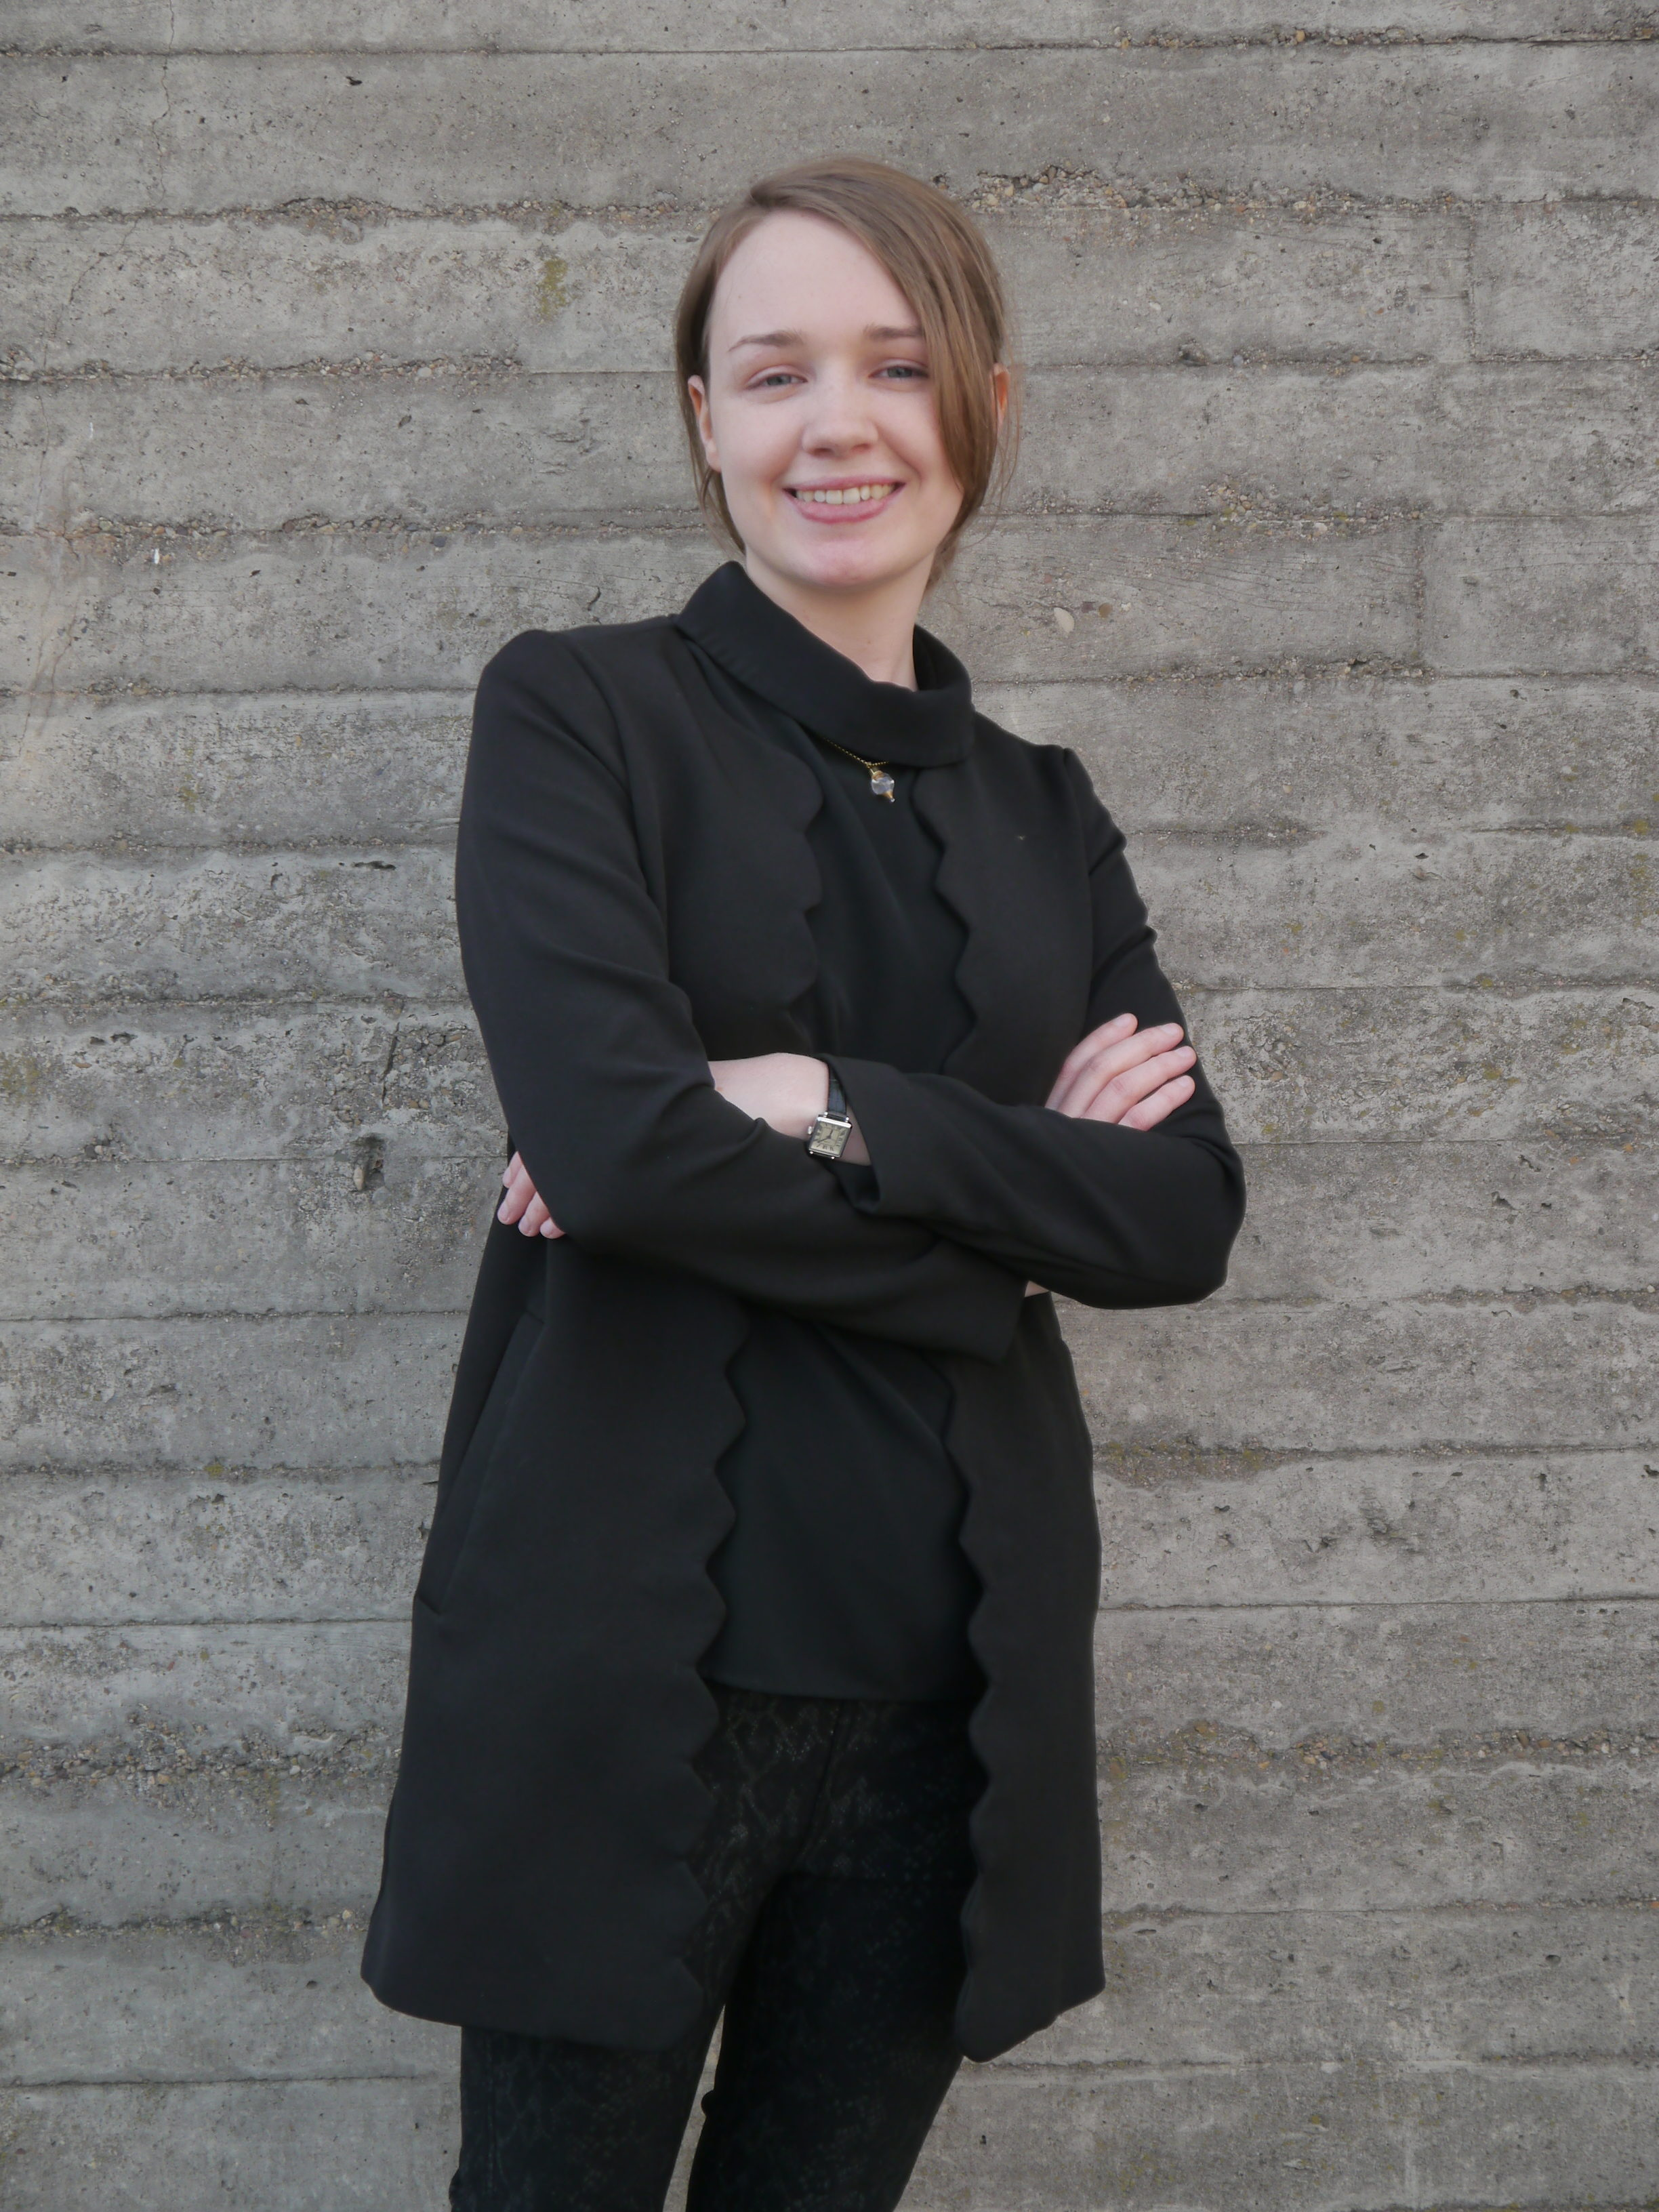 Layla Rohkohl